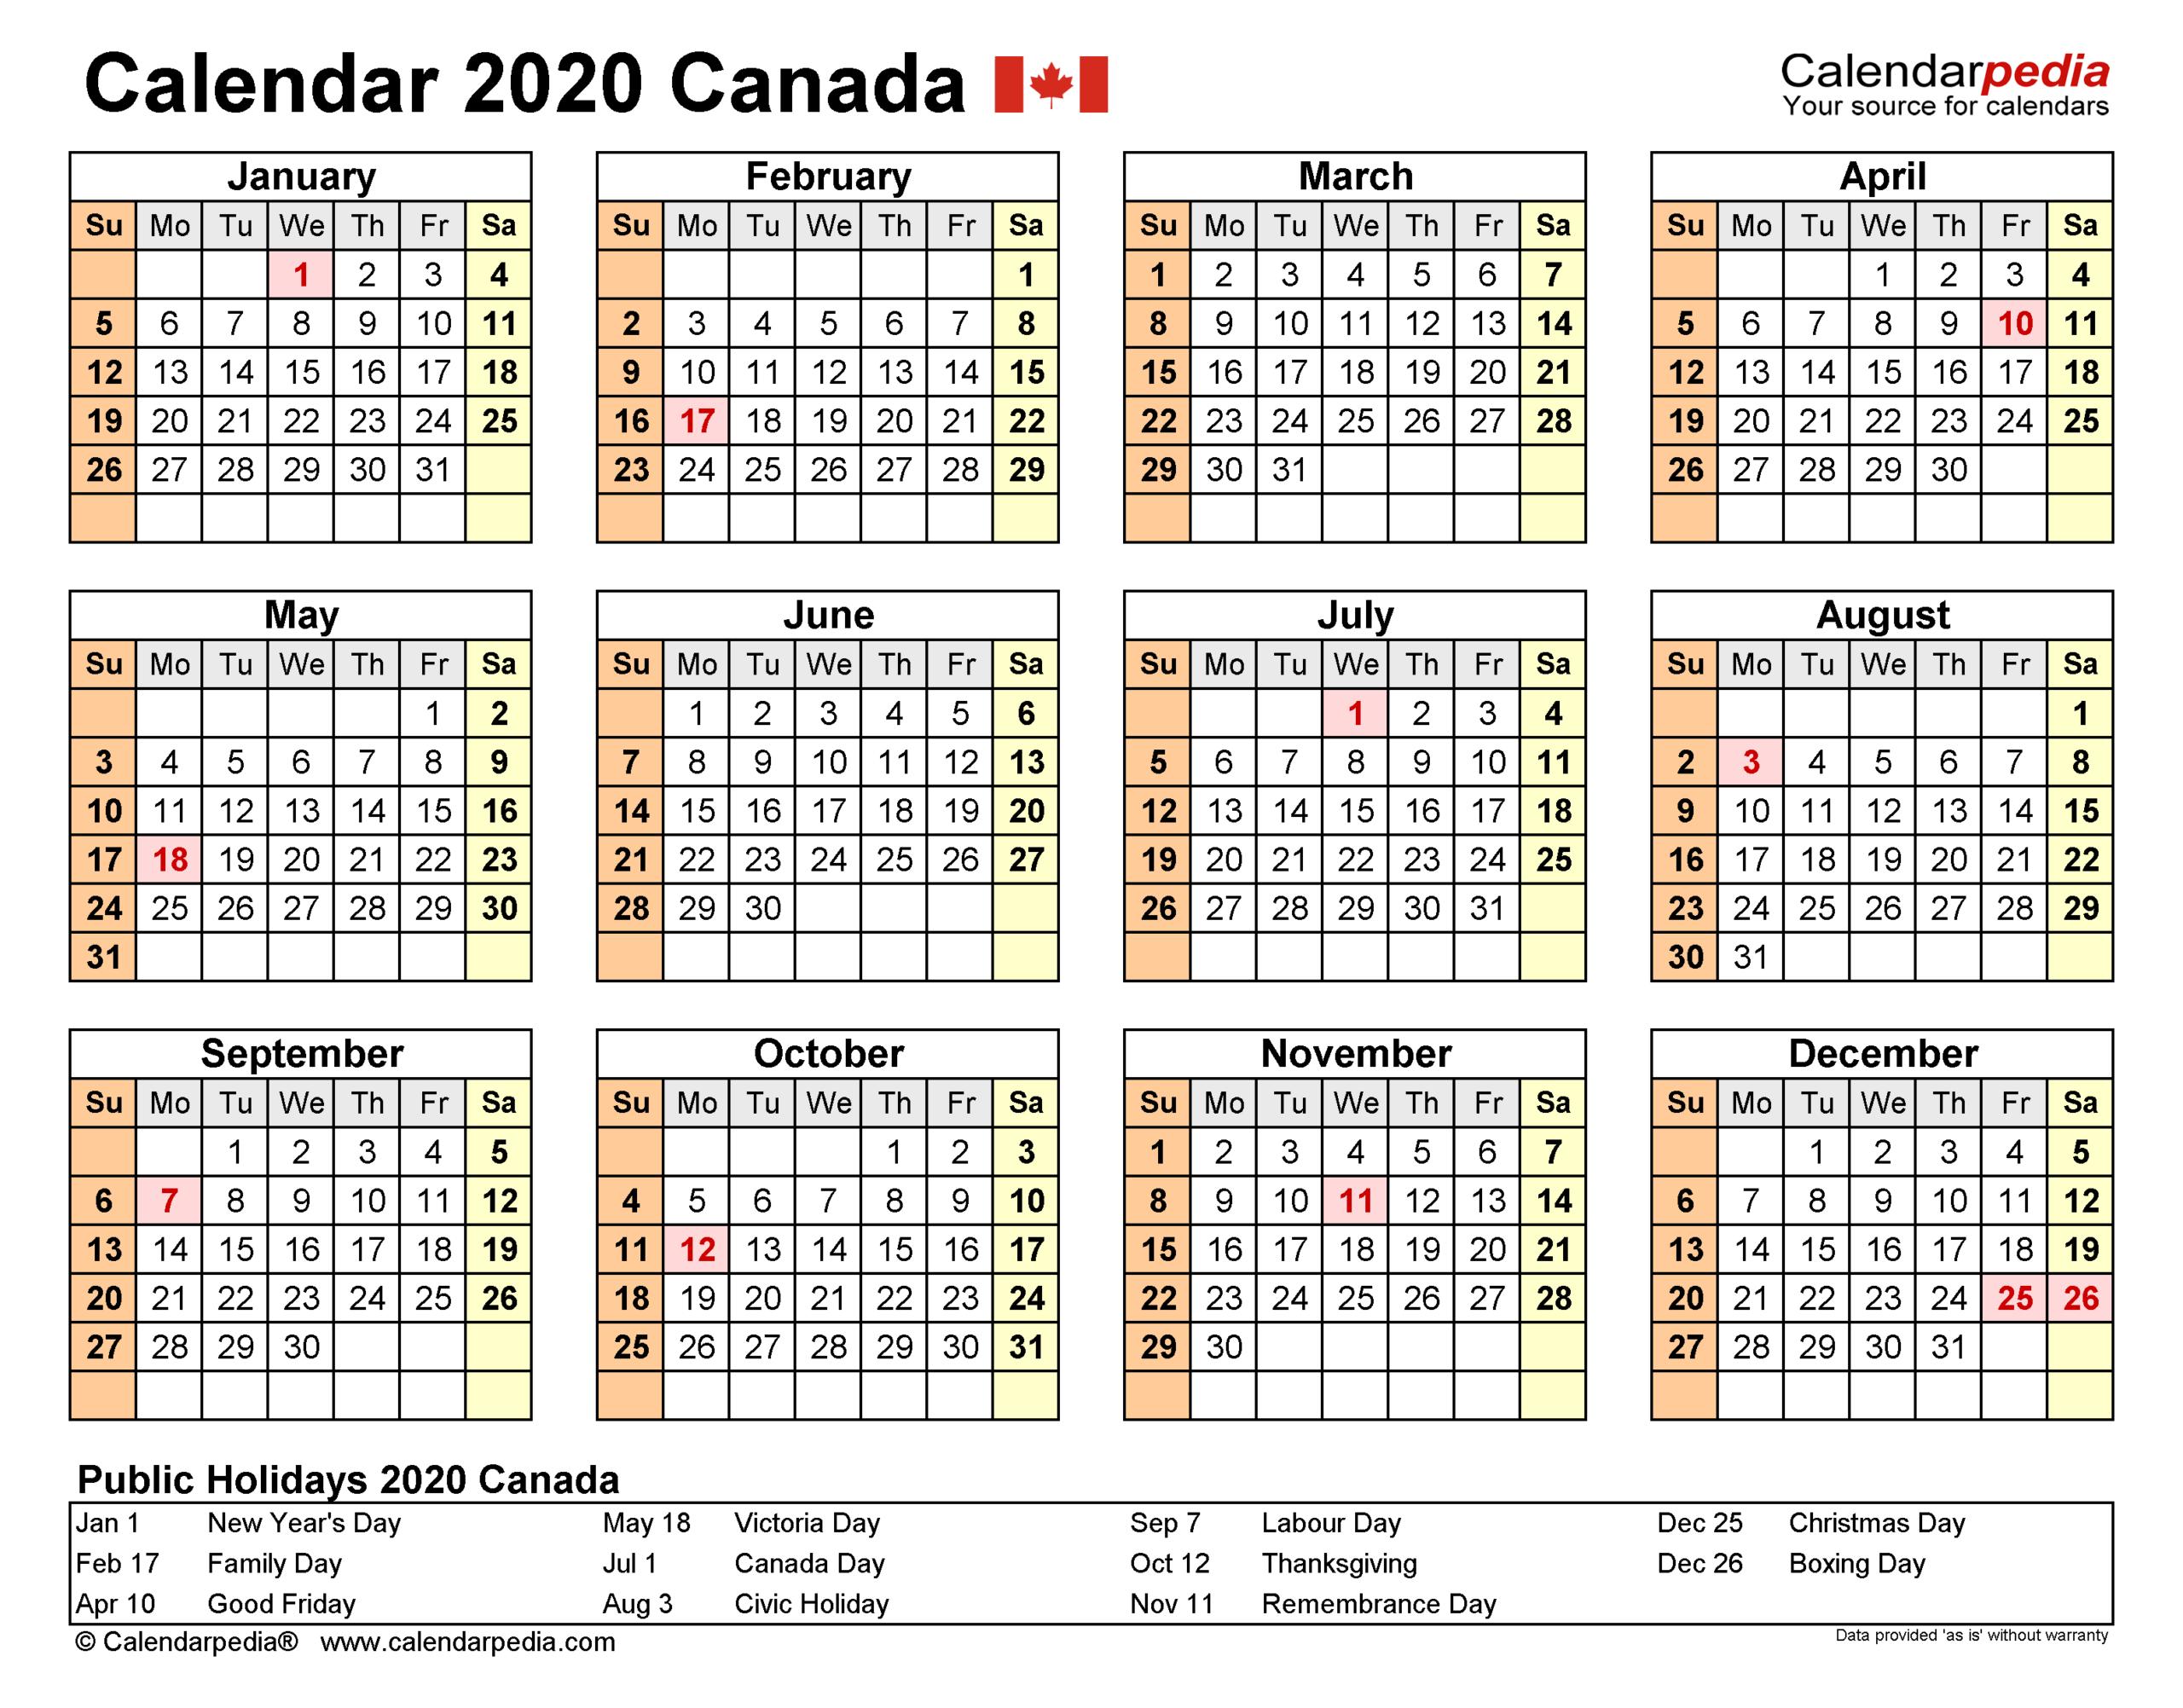 Canada Calendar 2020 - Free Printable Excel Templates